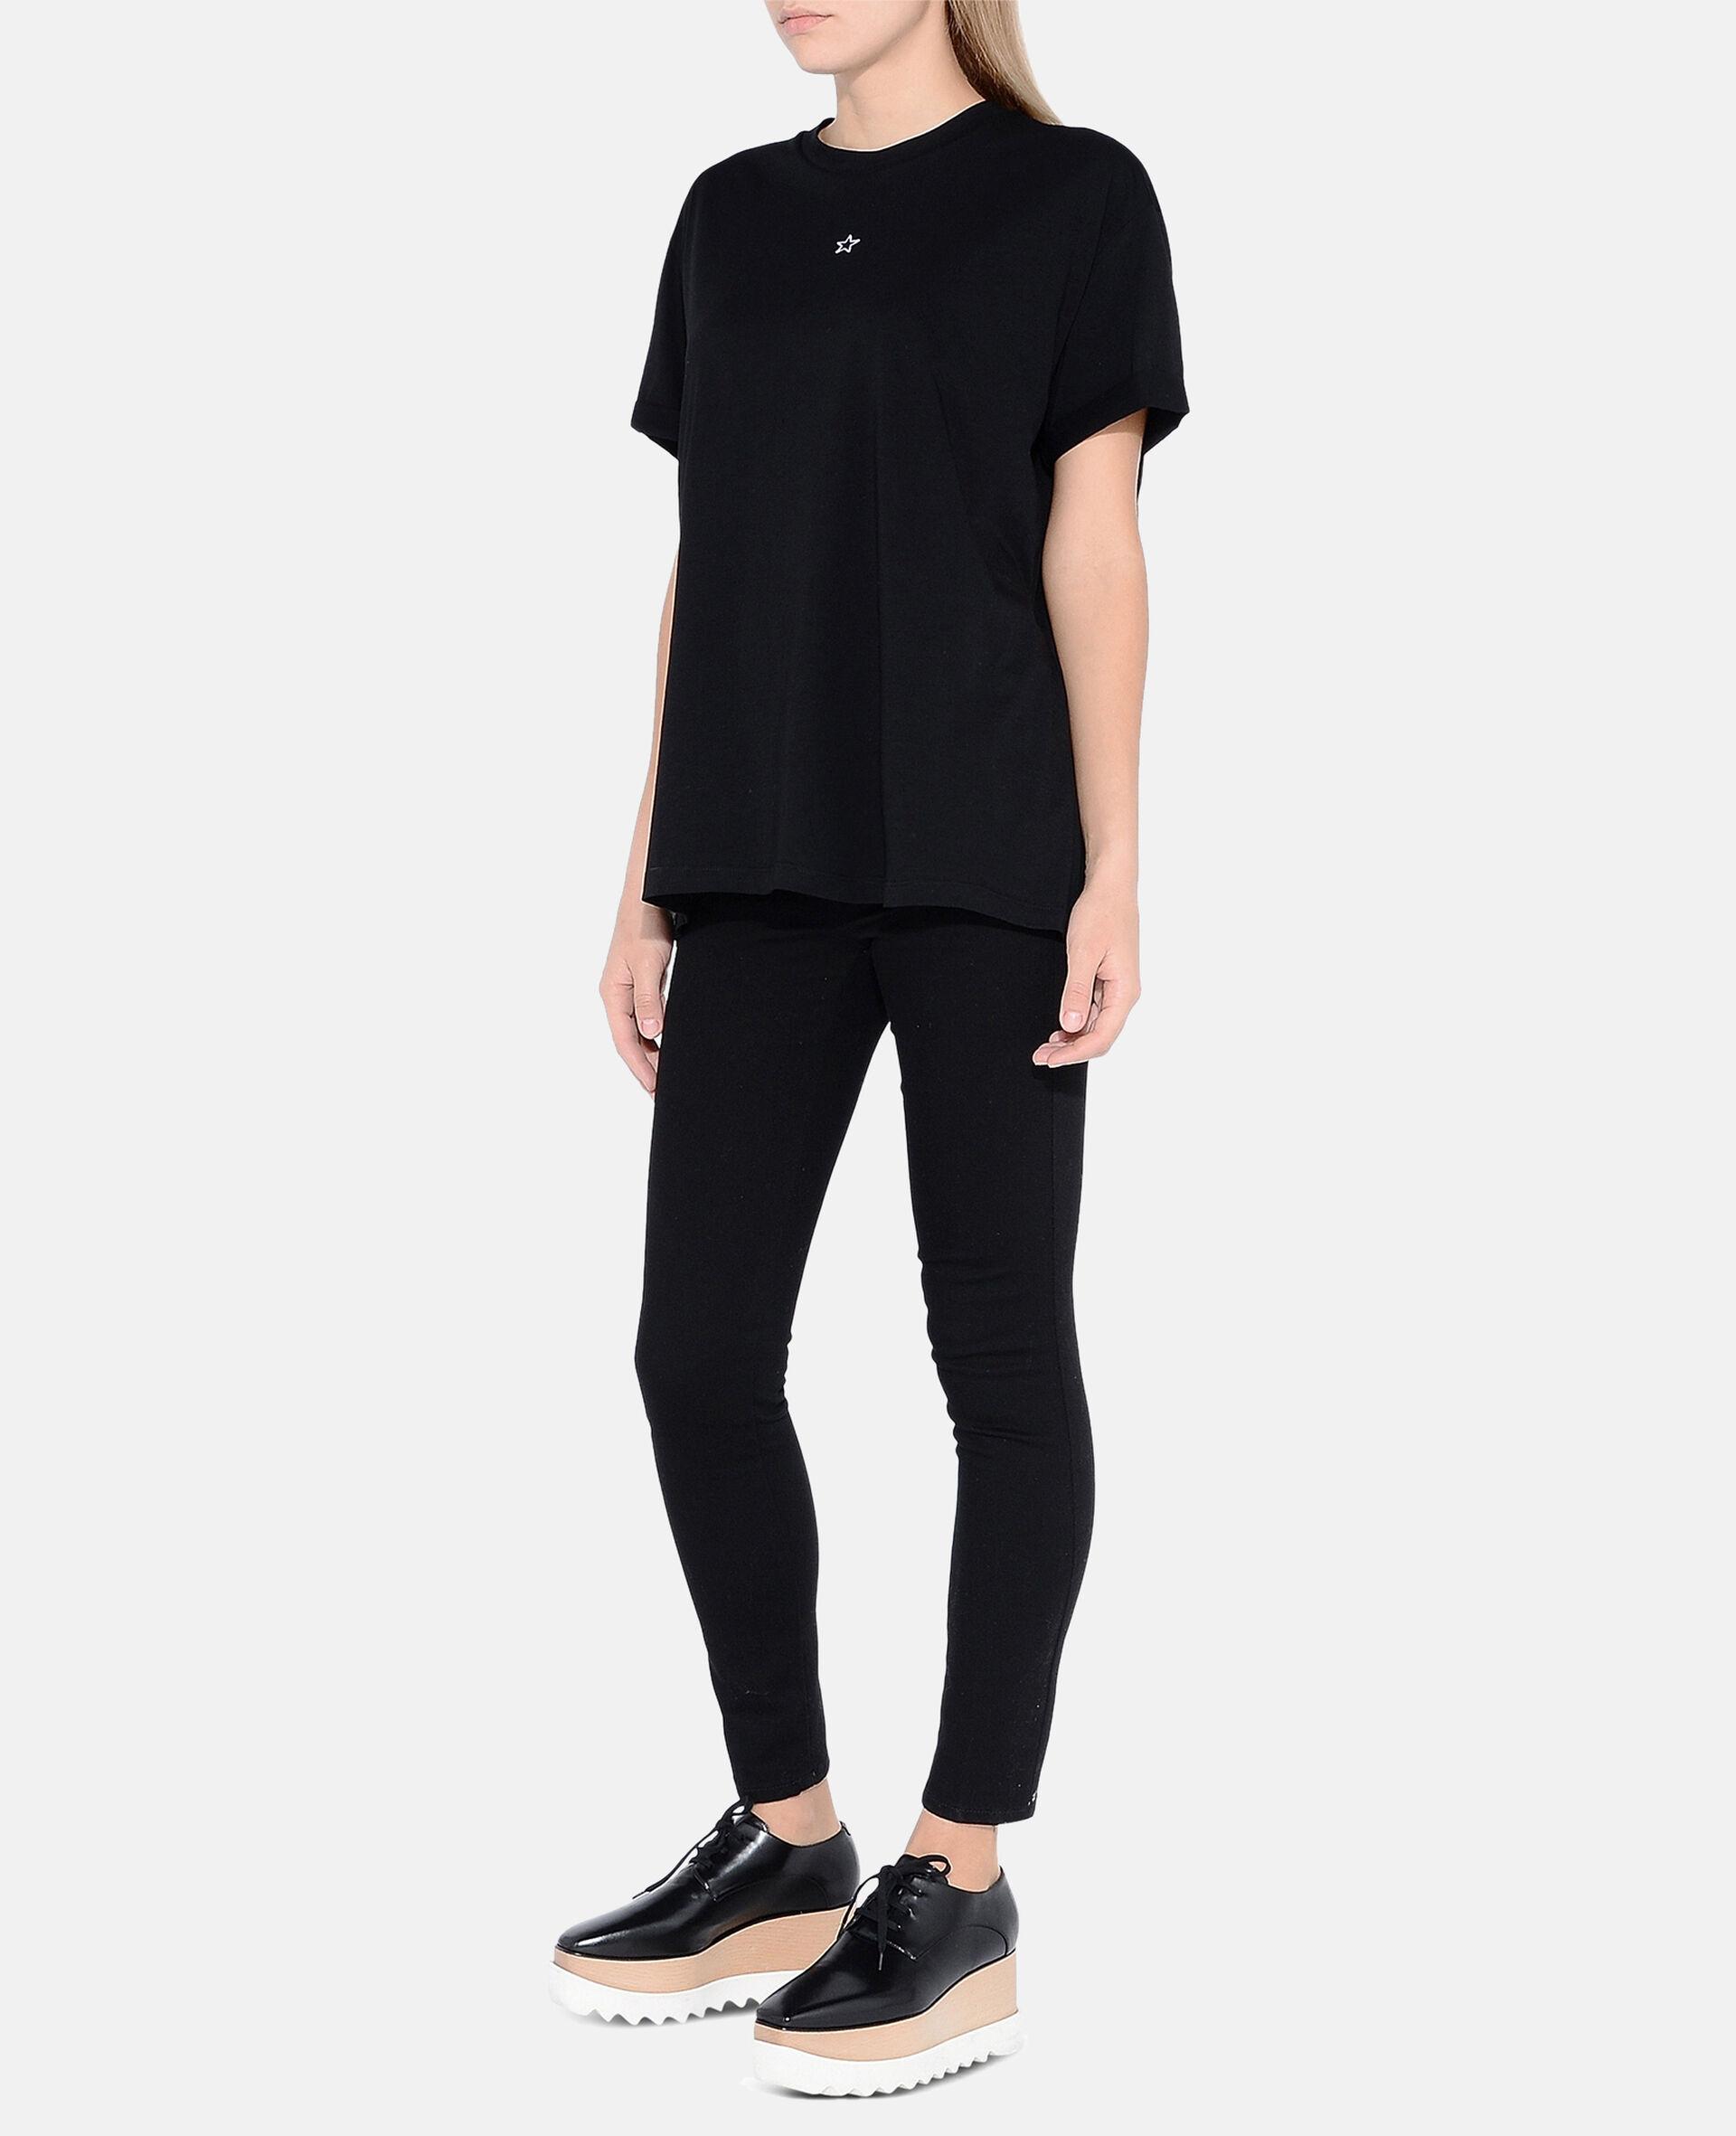 T-Shirt Ministar-Schwarz-large image number 1